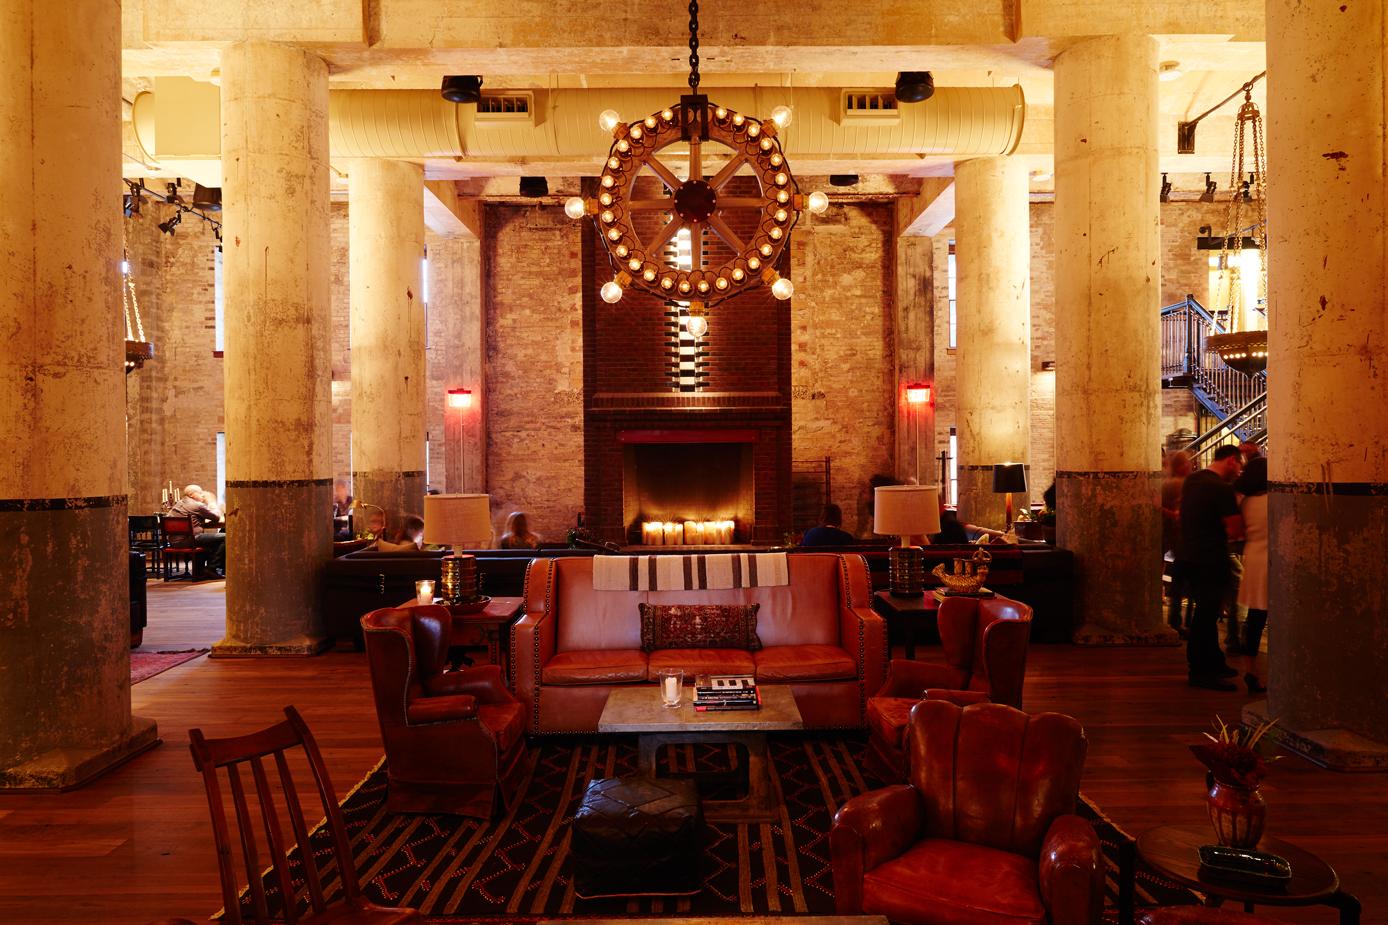 HotelEmma_Sterneworth_NF_0474_web.jpg